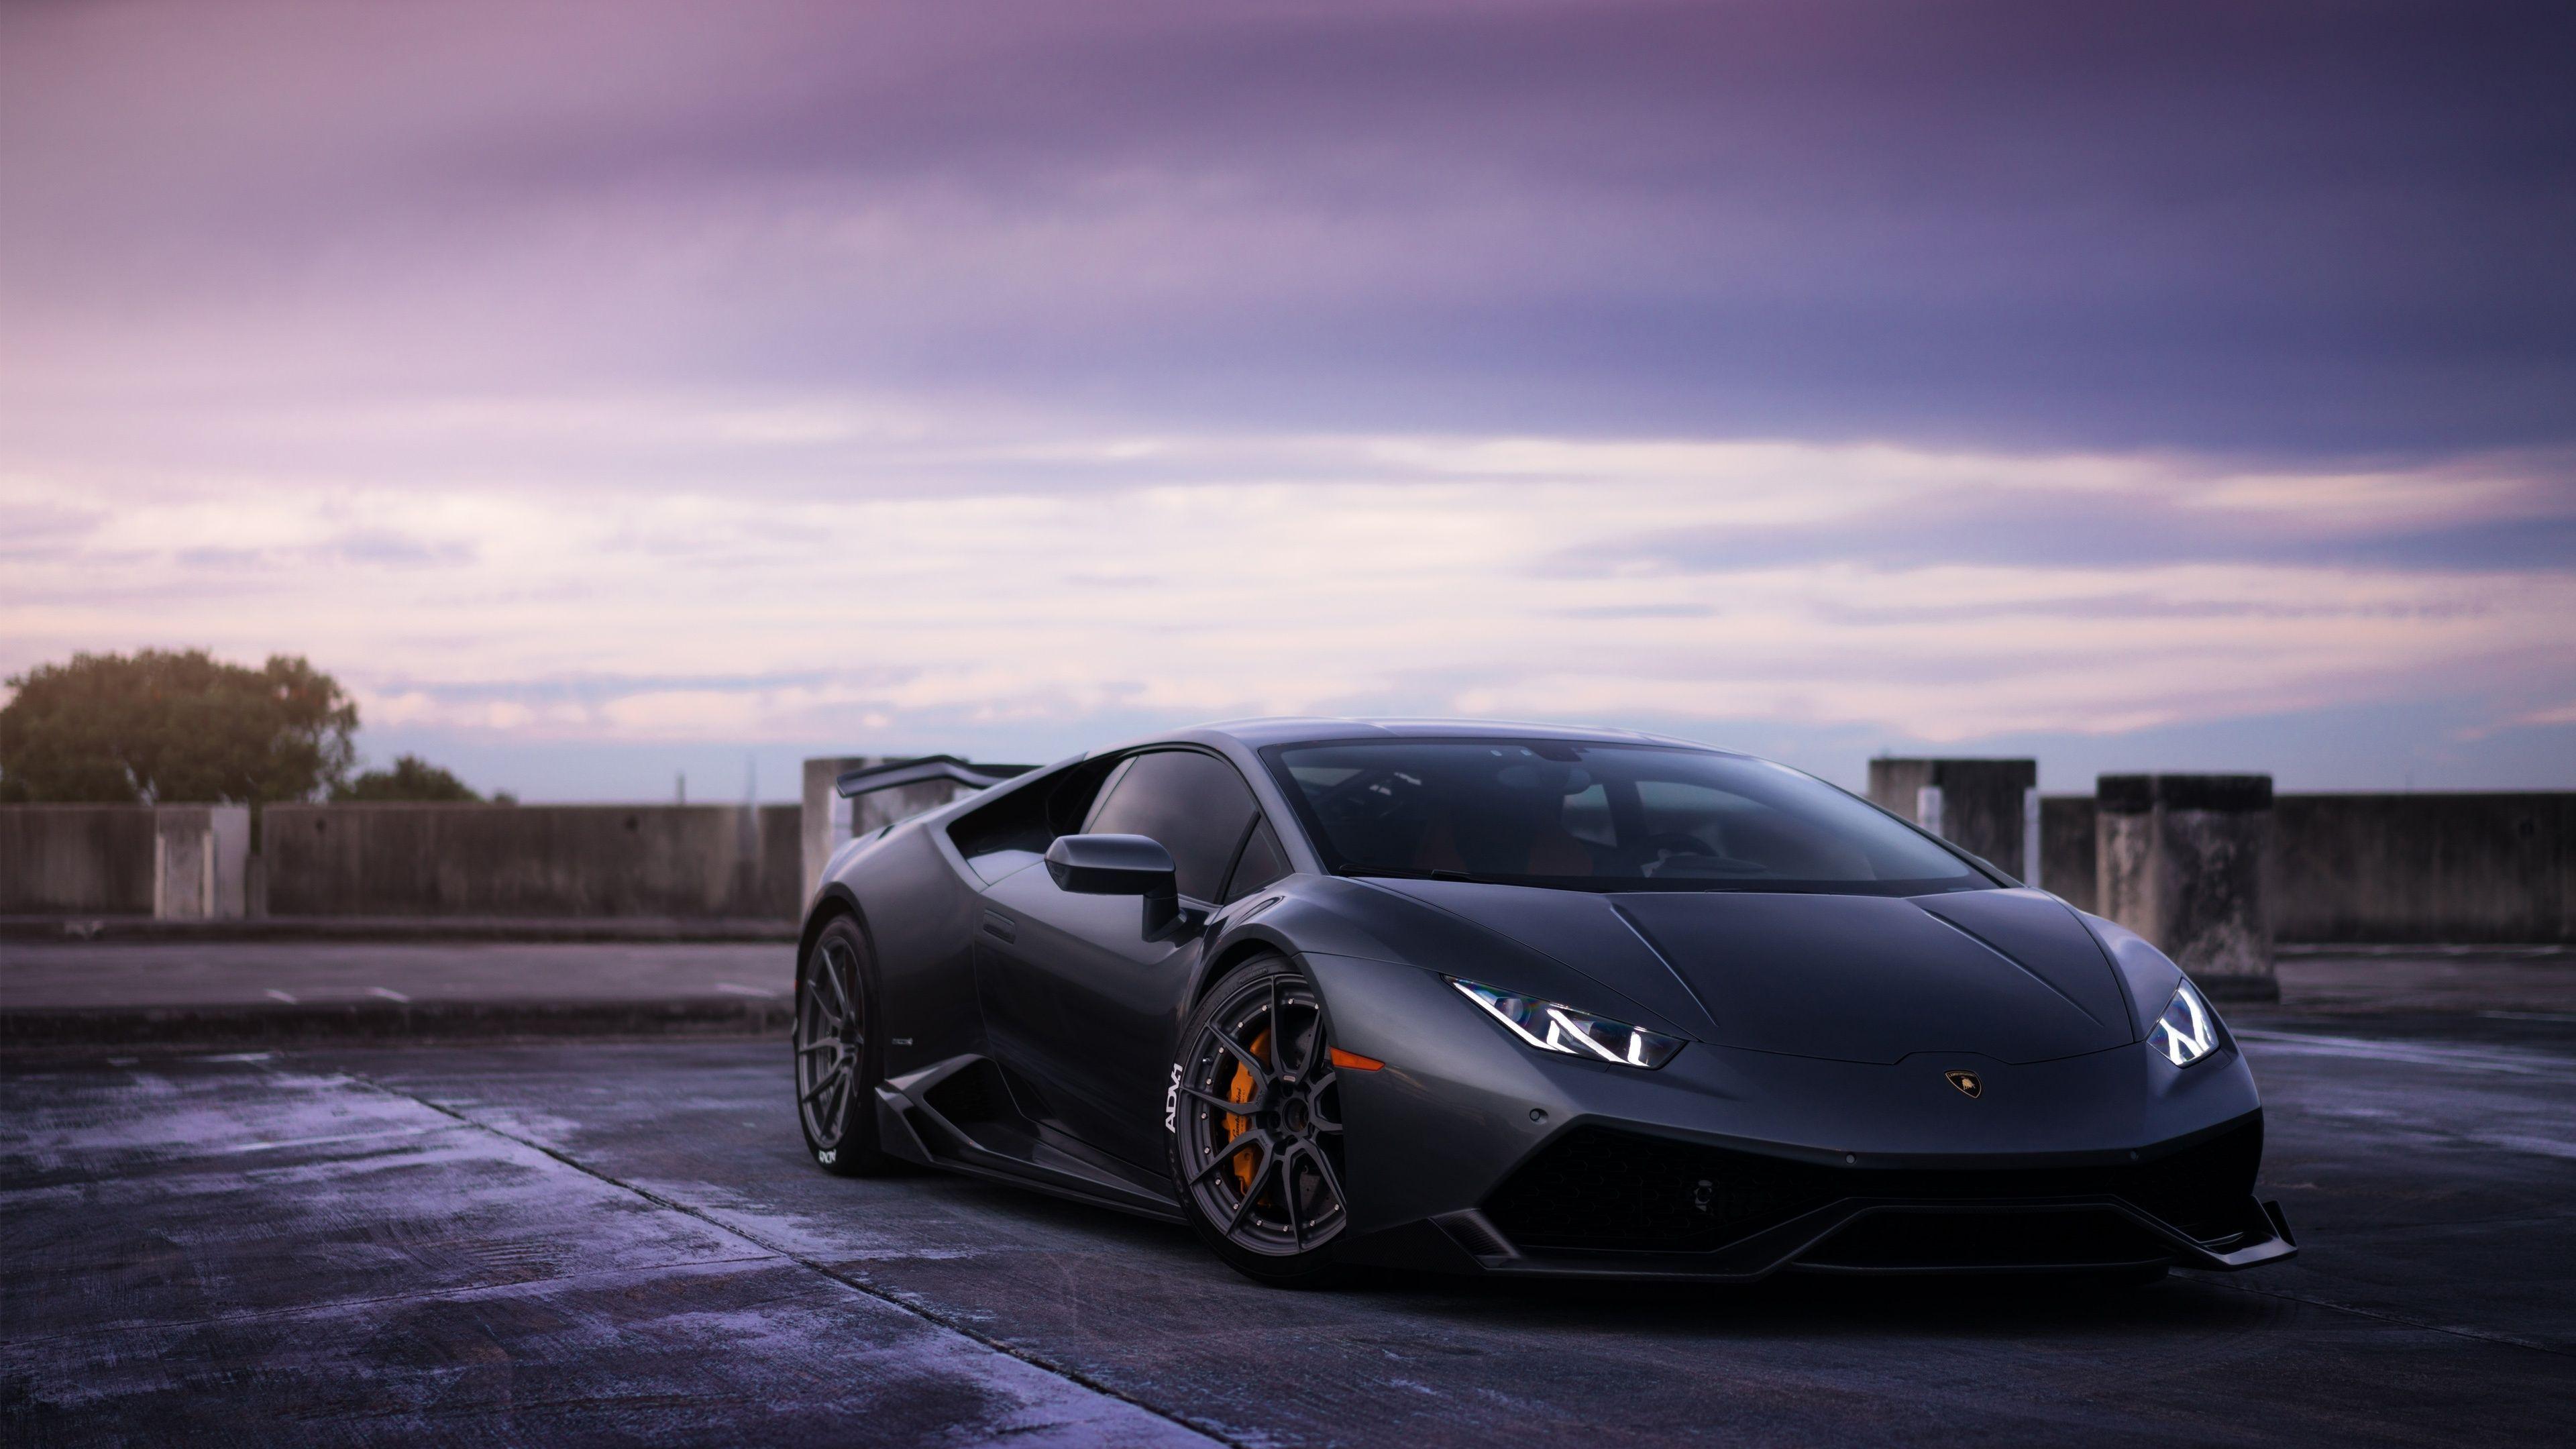 Lamborghini Huracan Wallpapers Images | Vehicles Wallpapers | Lamborghini cars, Lamborghini ...